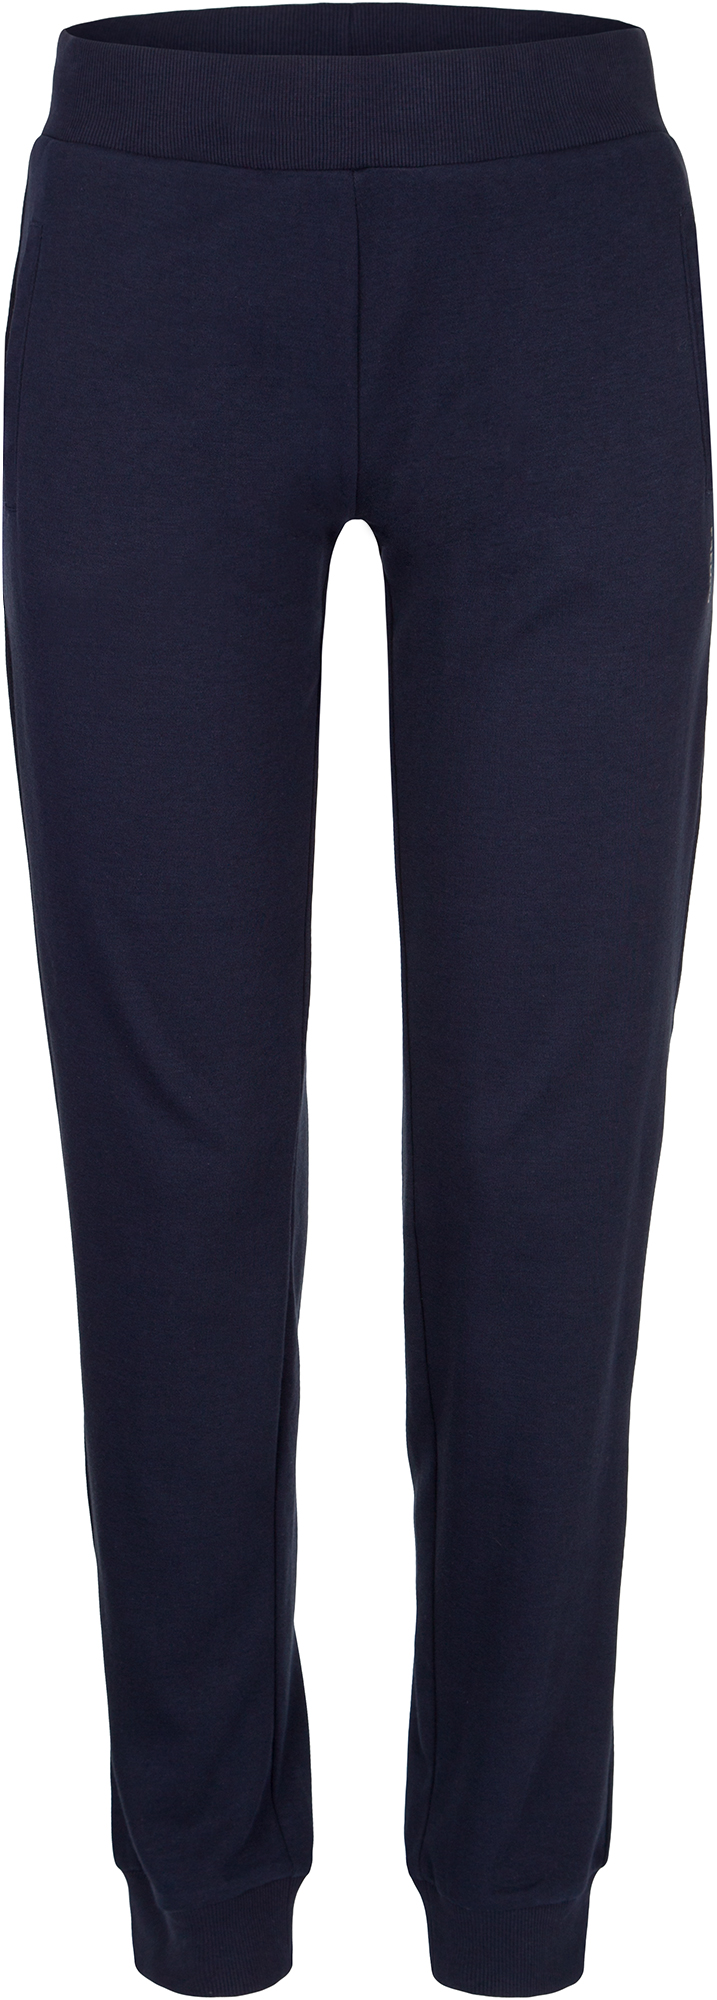 Freddy Брюки женские Basic Cotton, размер 48-50